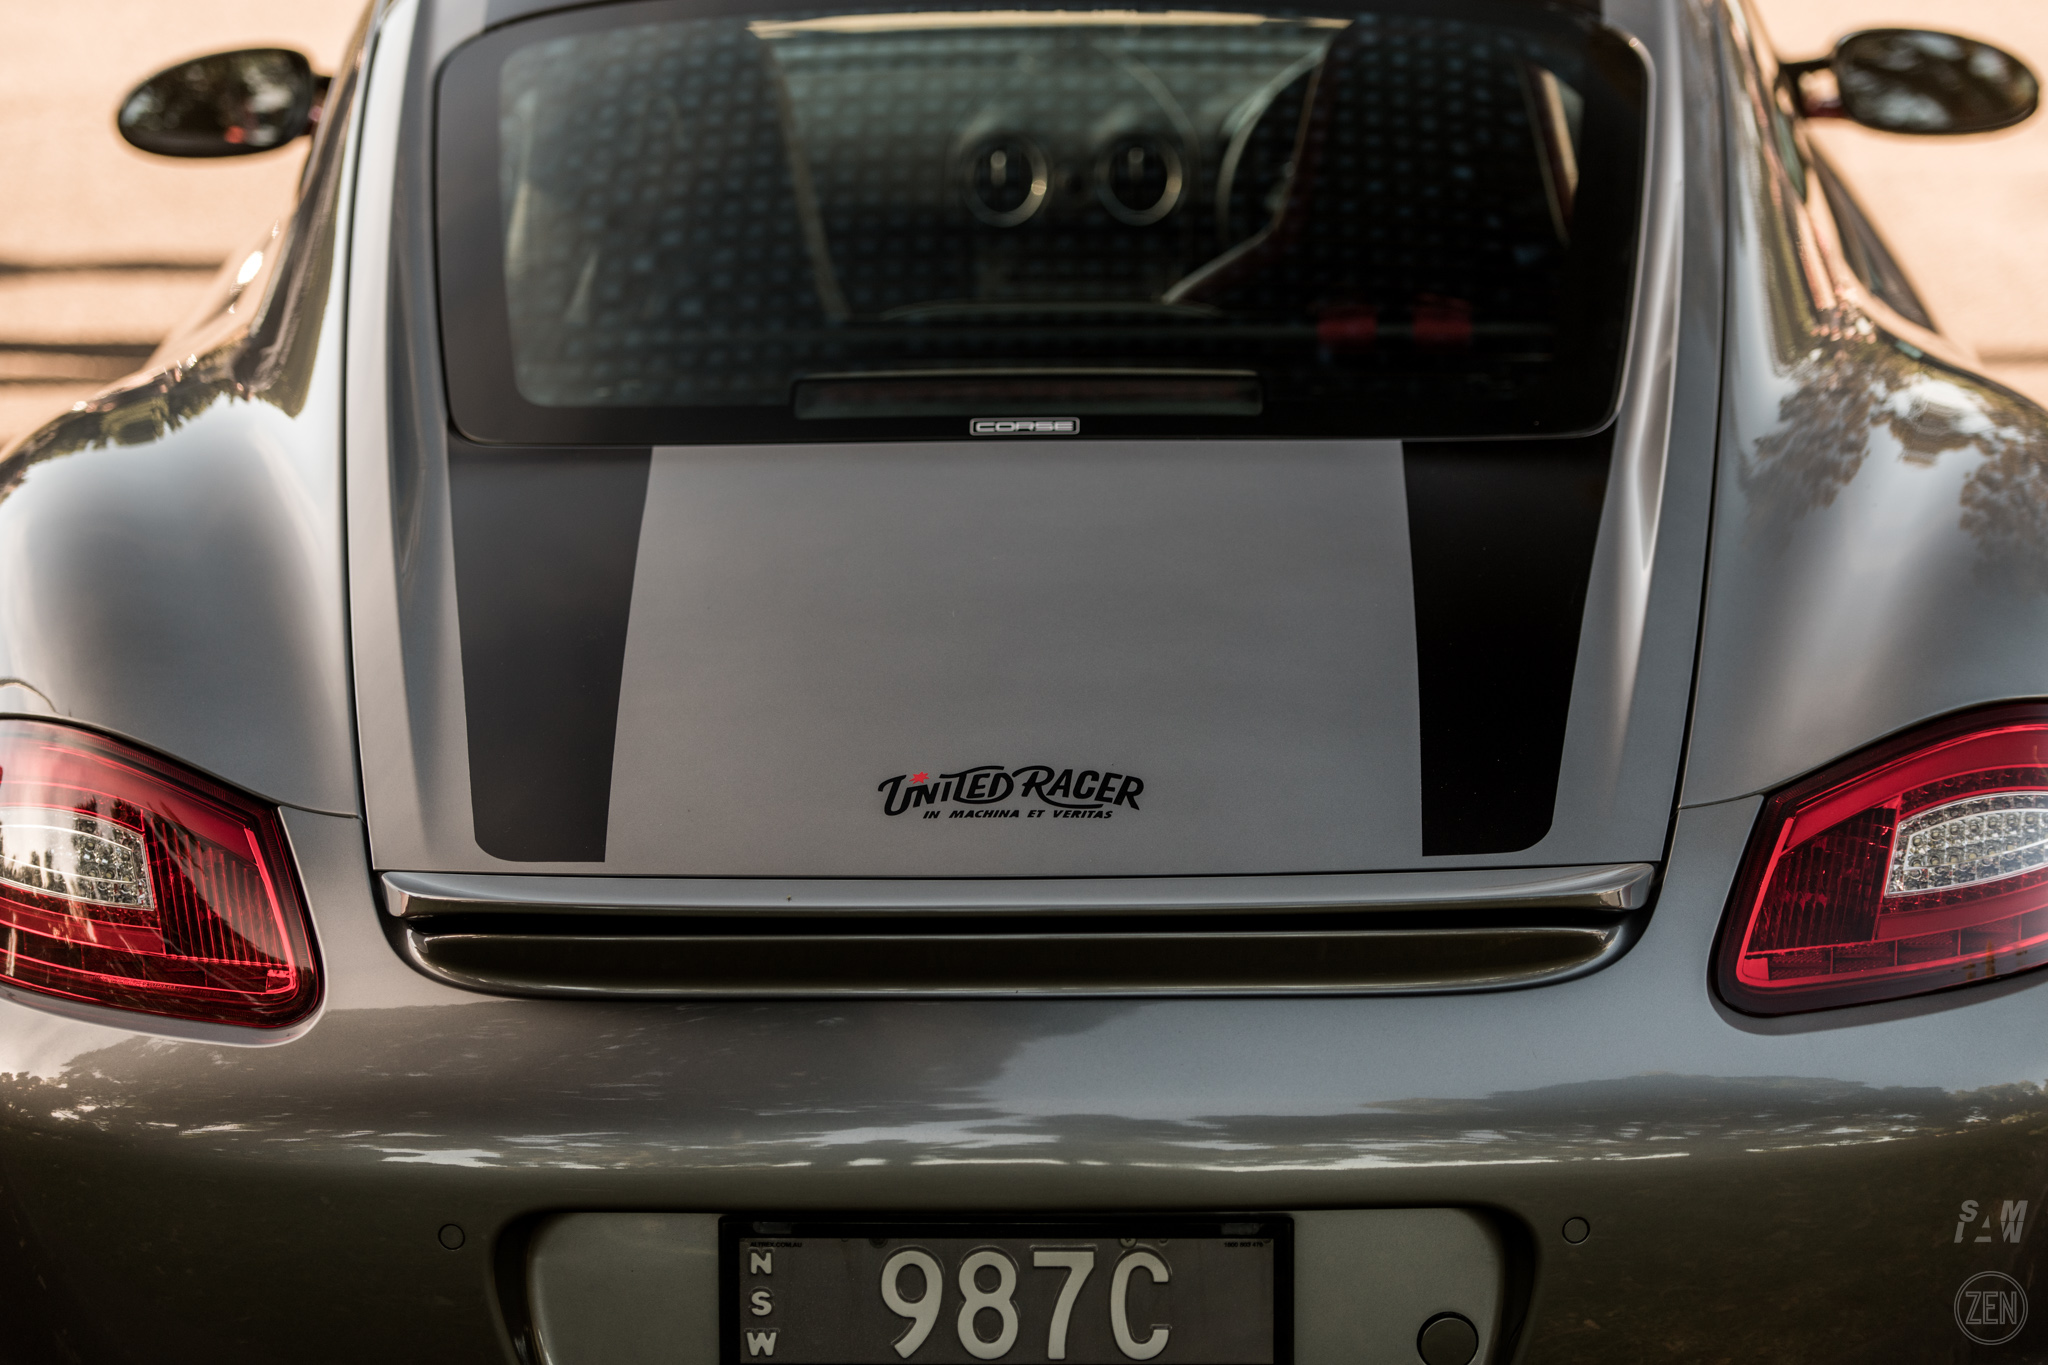 2019-10-27 - Autohaus Porsches & Coffee 140